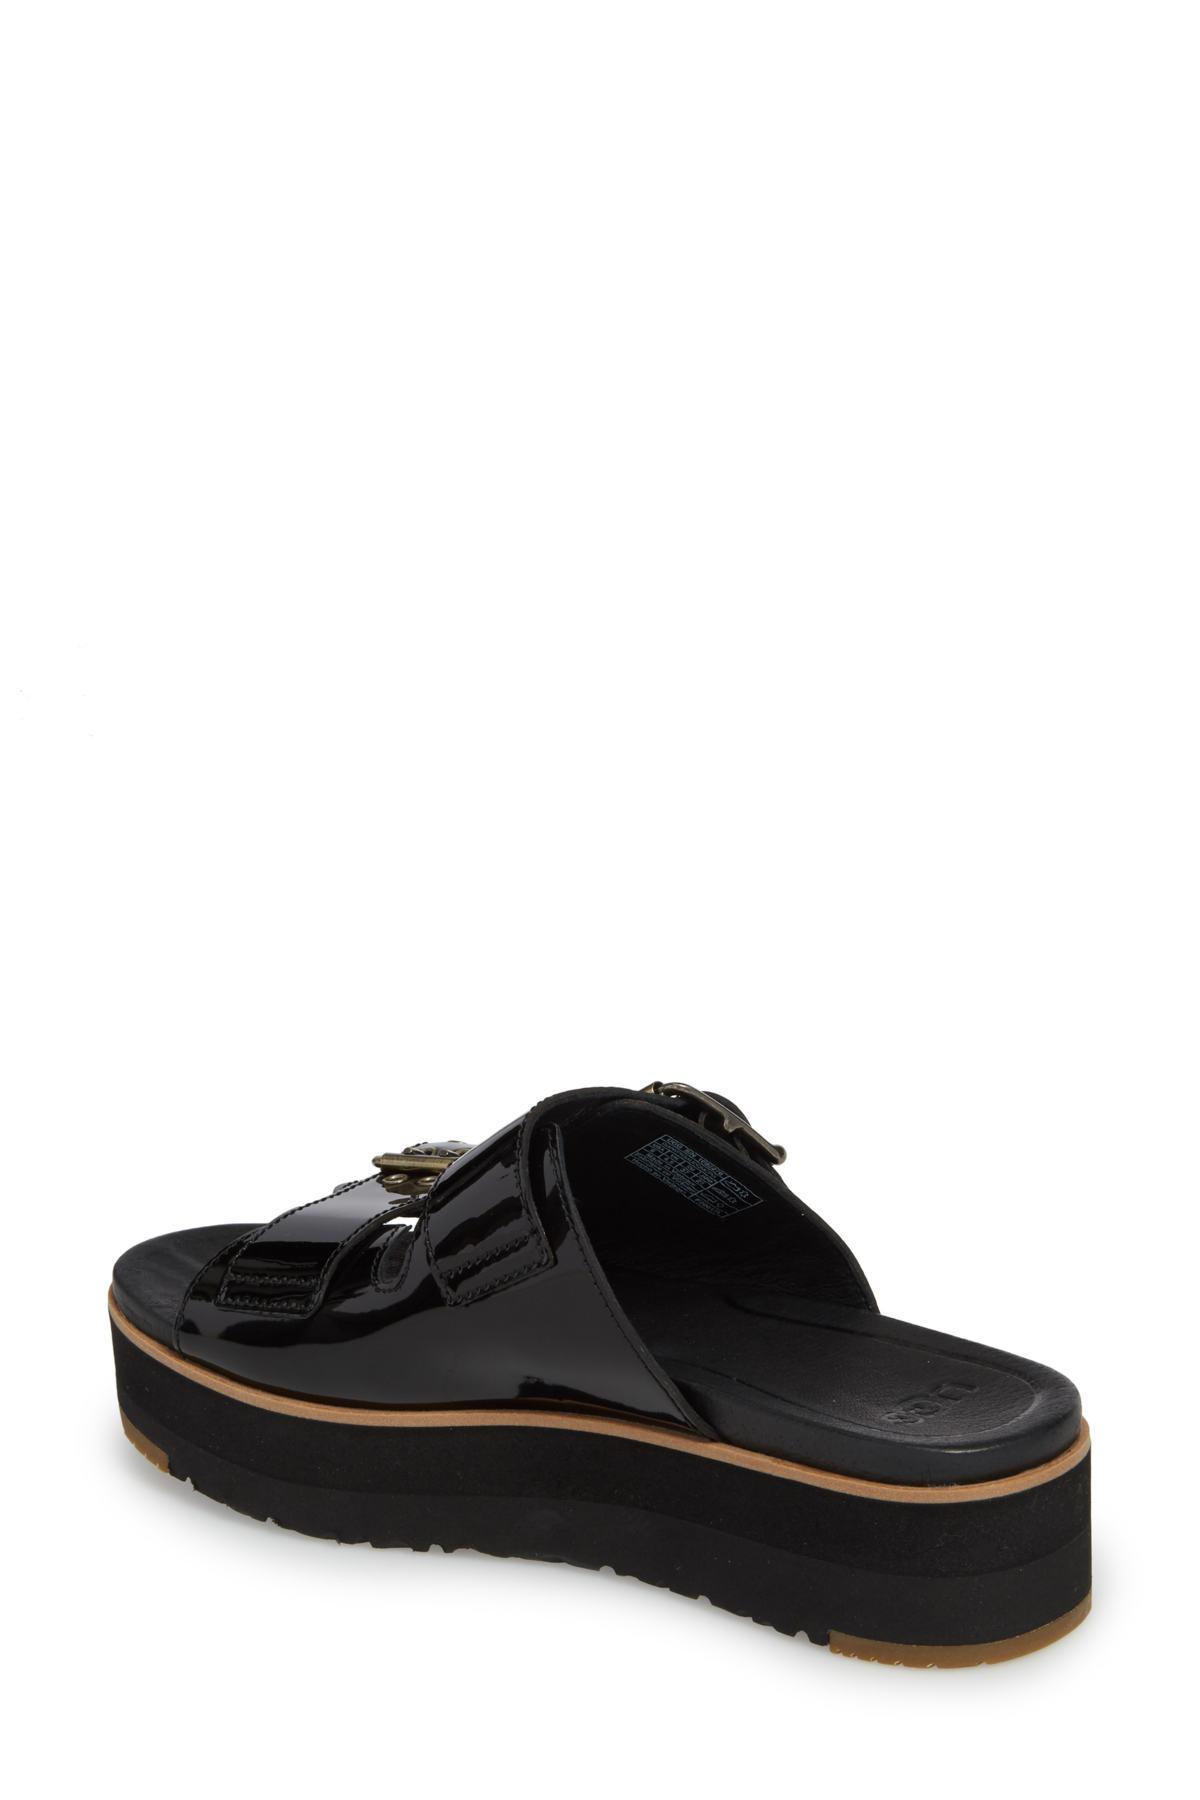 44c61777548 Lyst - UGG (r) Cammie Platform Slide Sandal (women) in Black